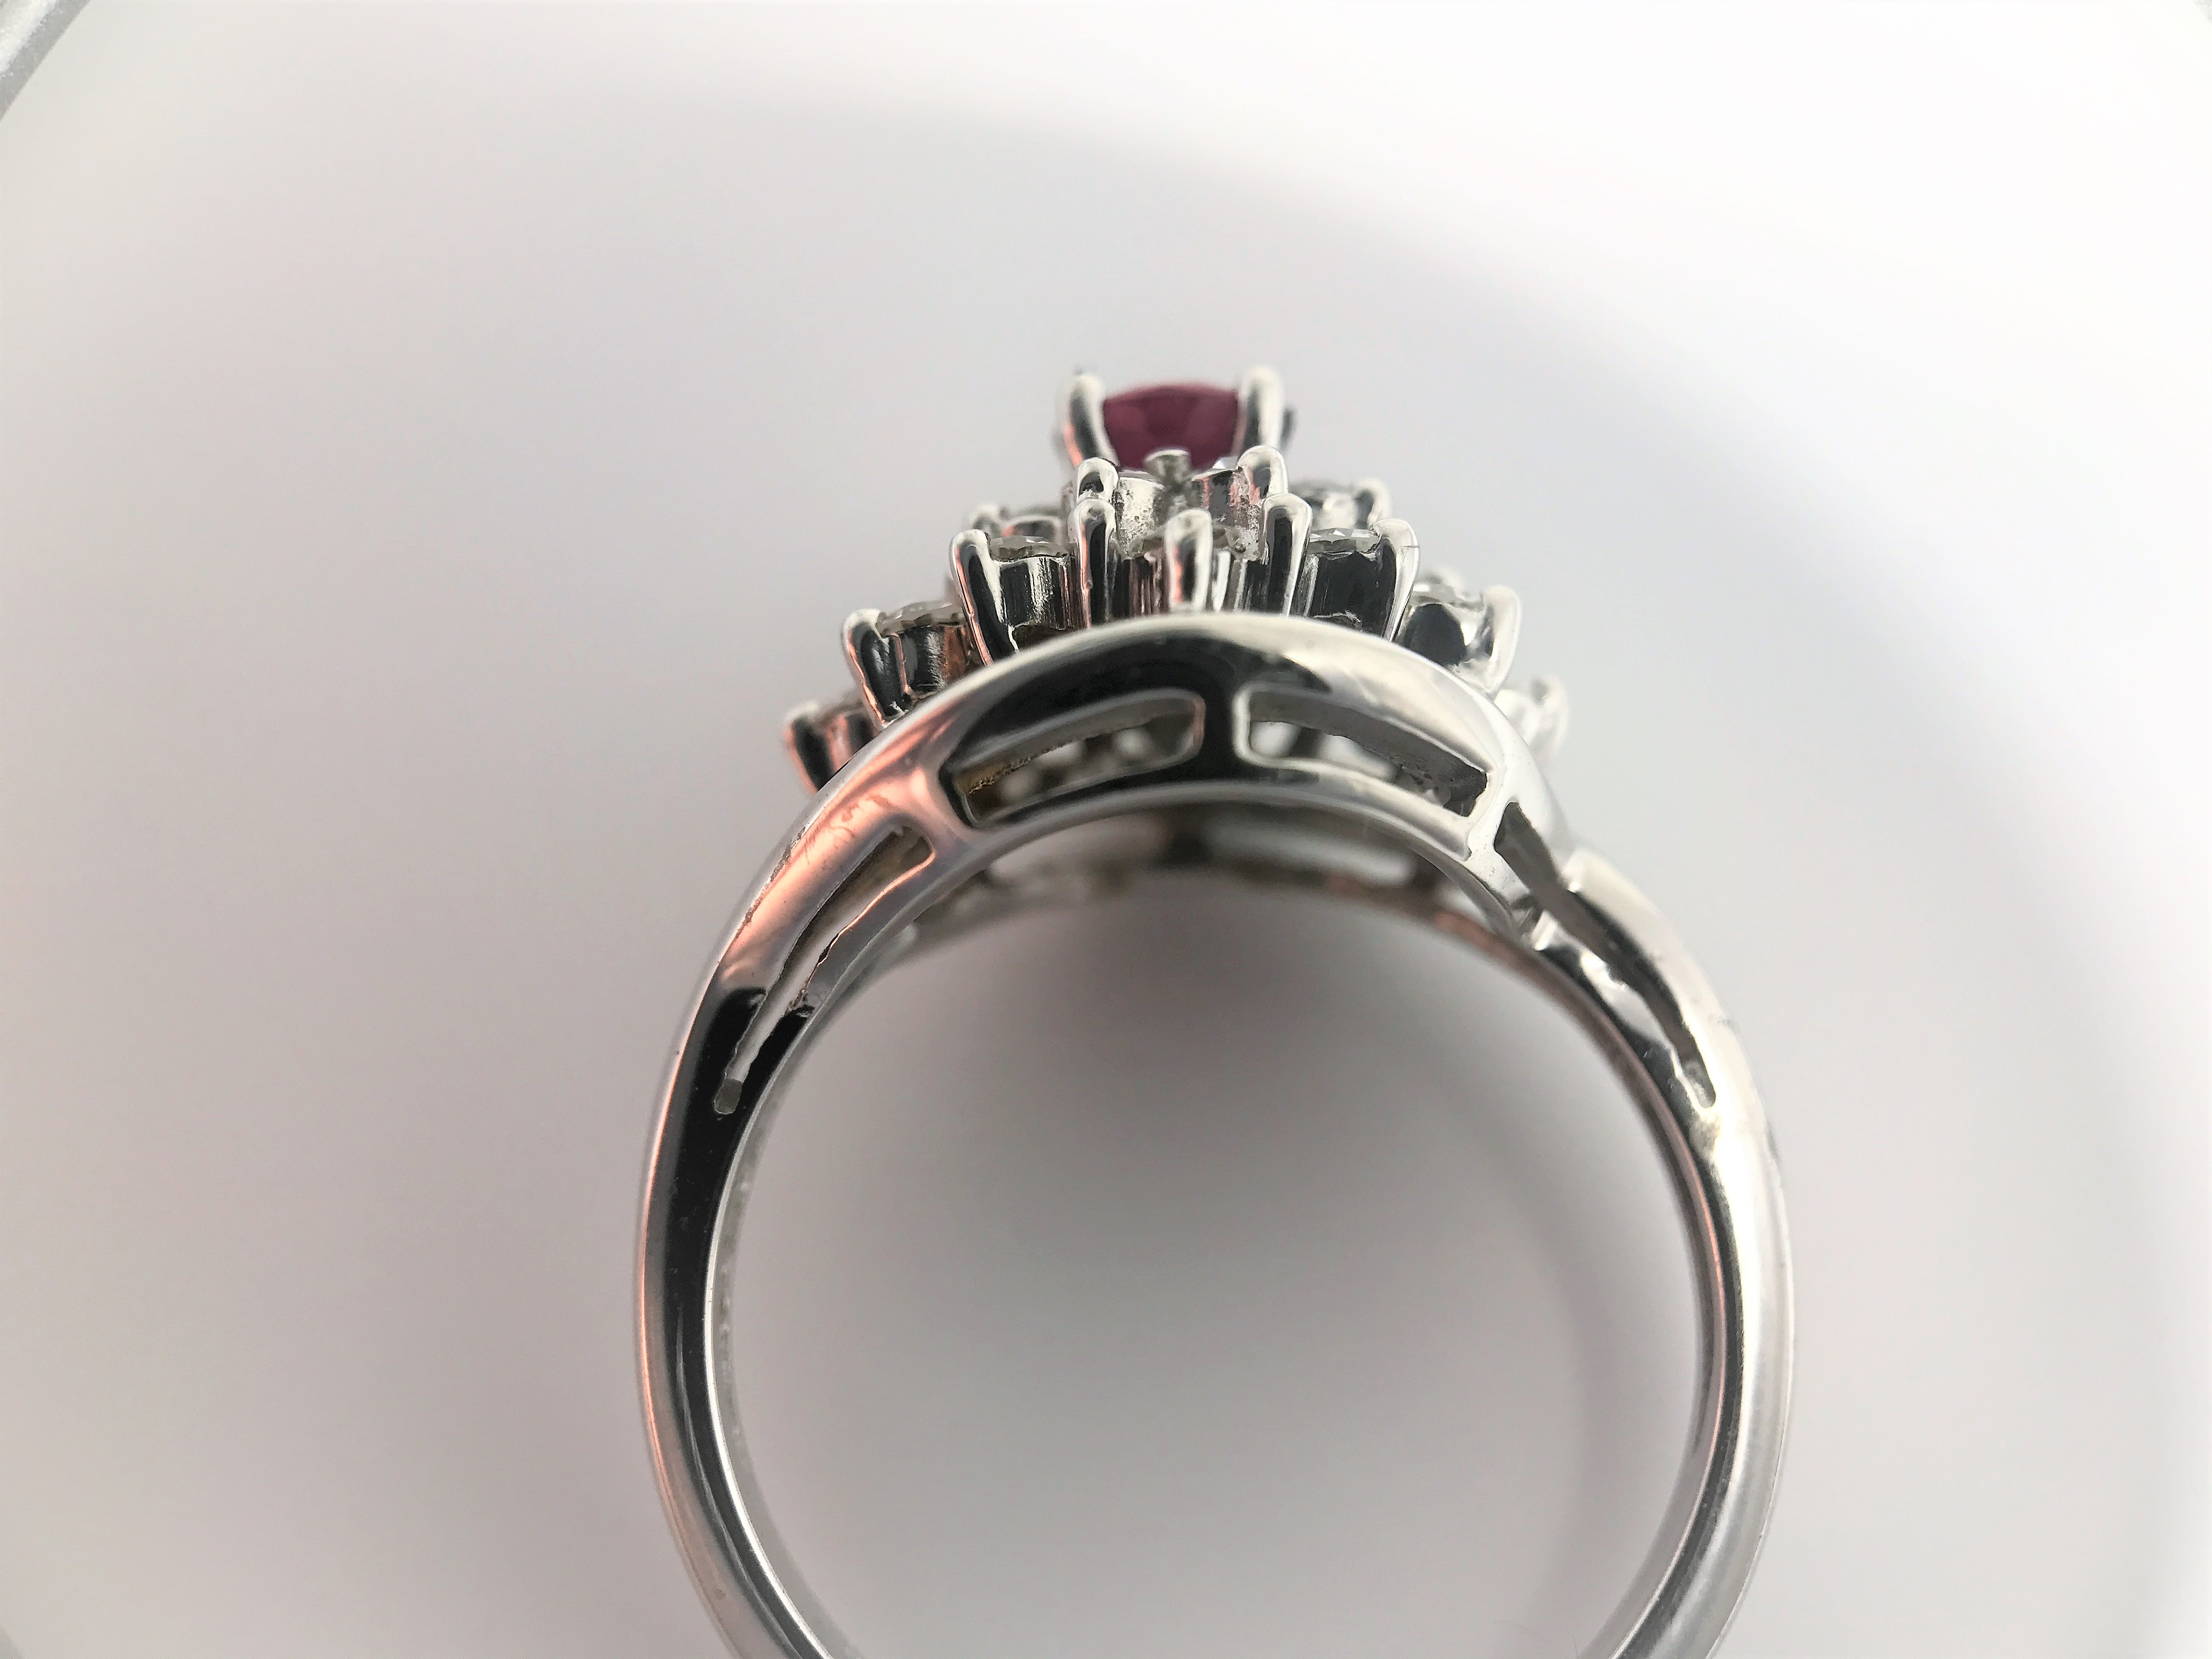 14k White Gold Ring Total weight: 3.3 gram - Image 2 of 3